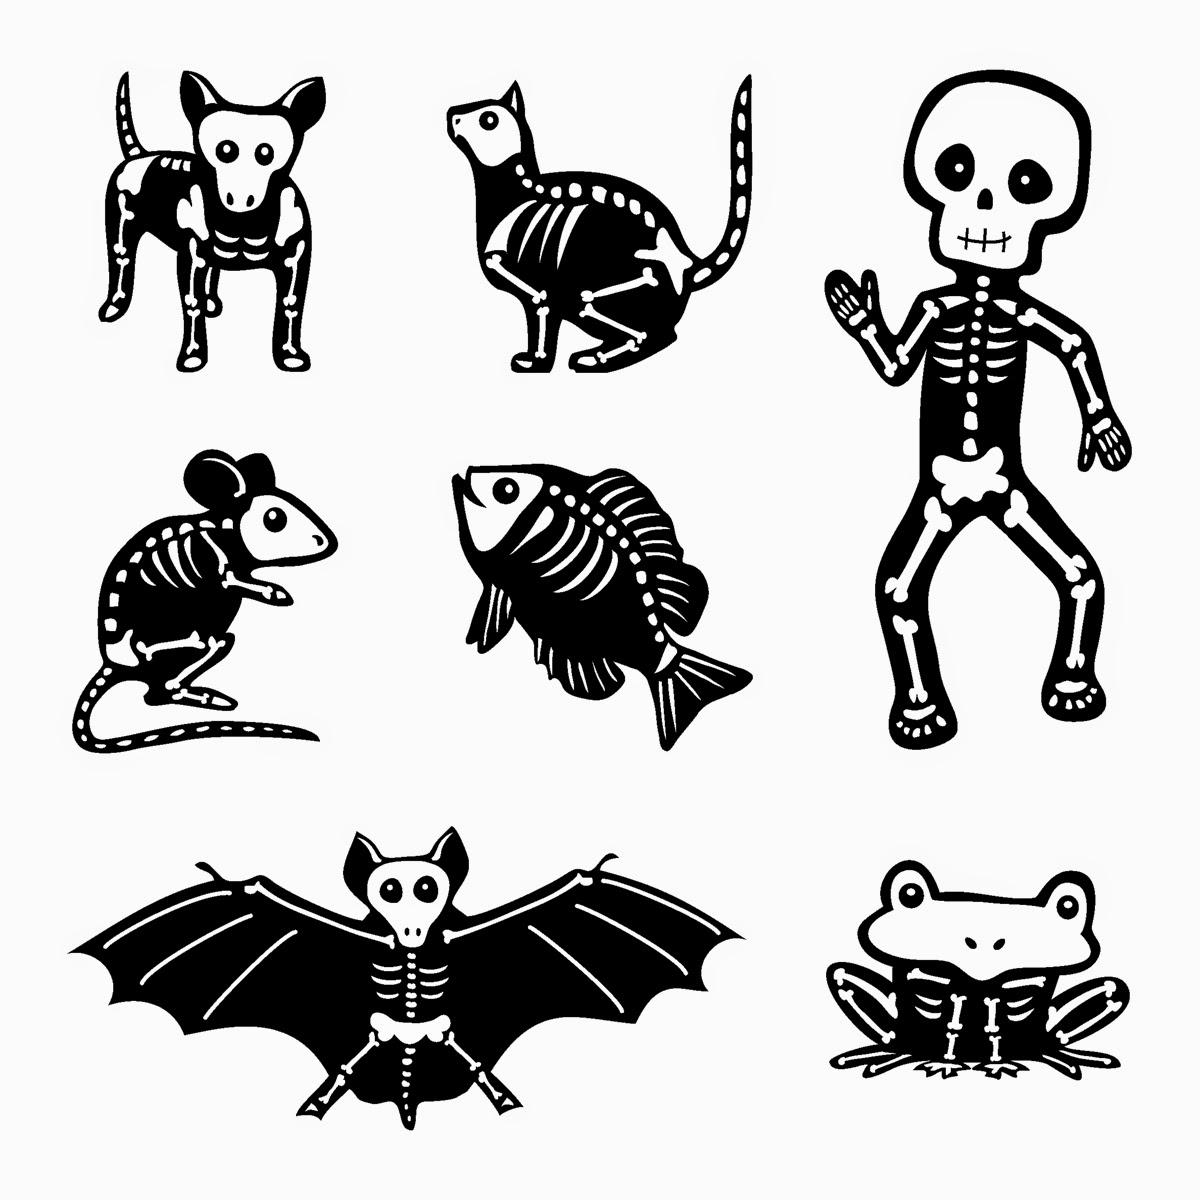 http://www.joann.com/inkadinkado-halloween-inchie-clear-stamps-little-skeletons/13402961.html